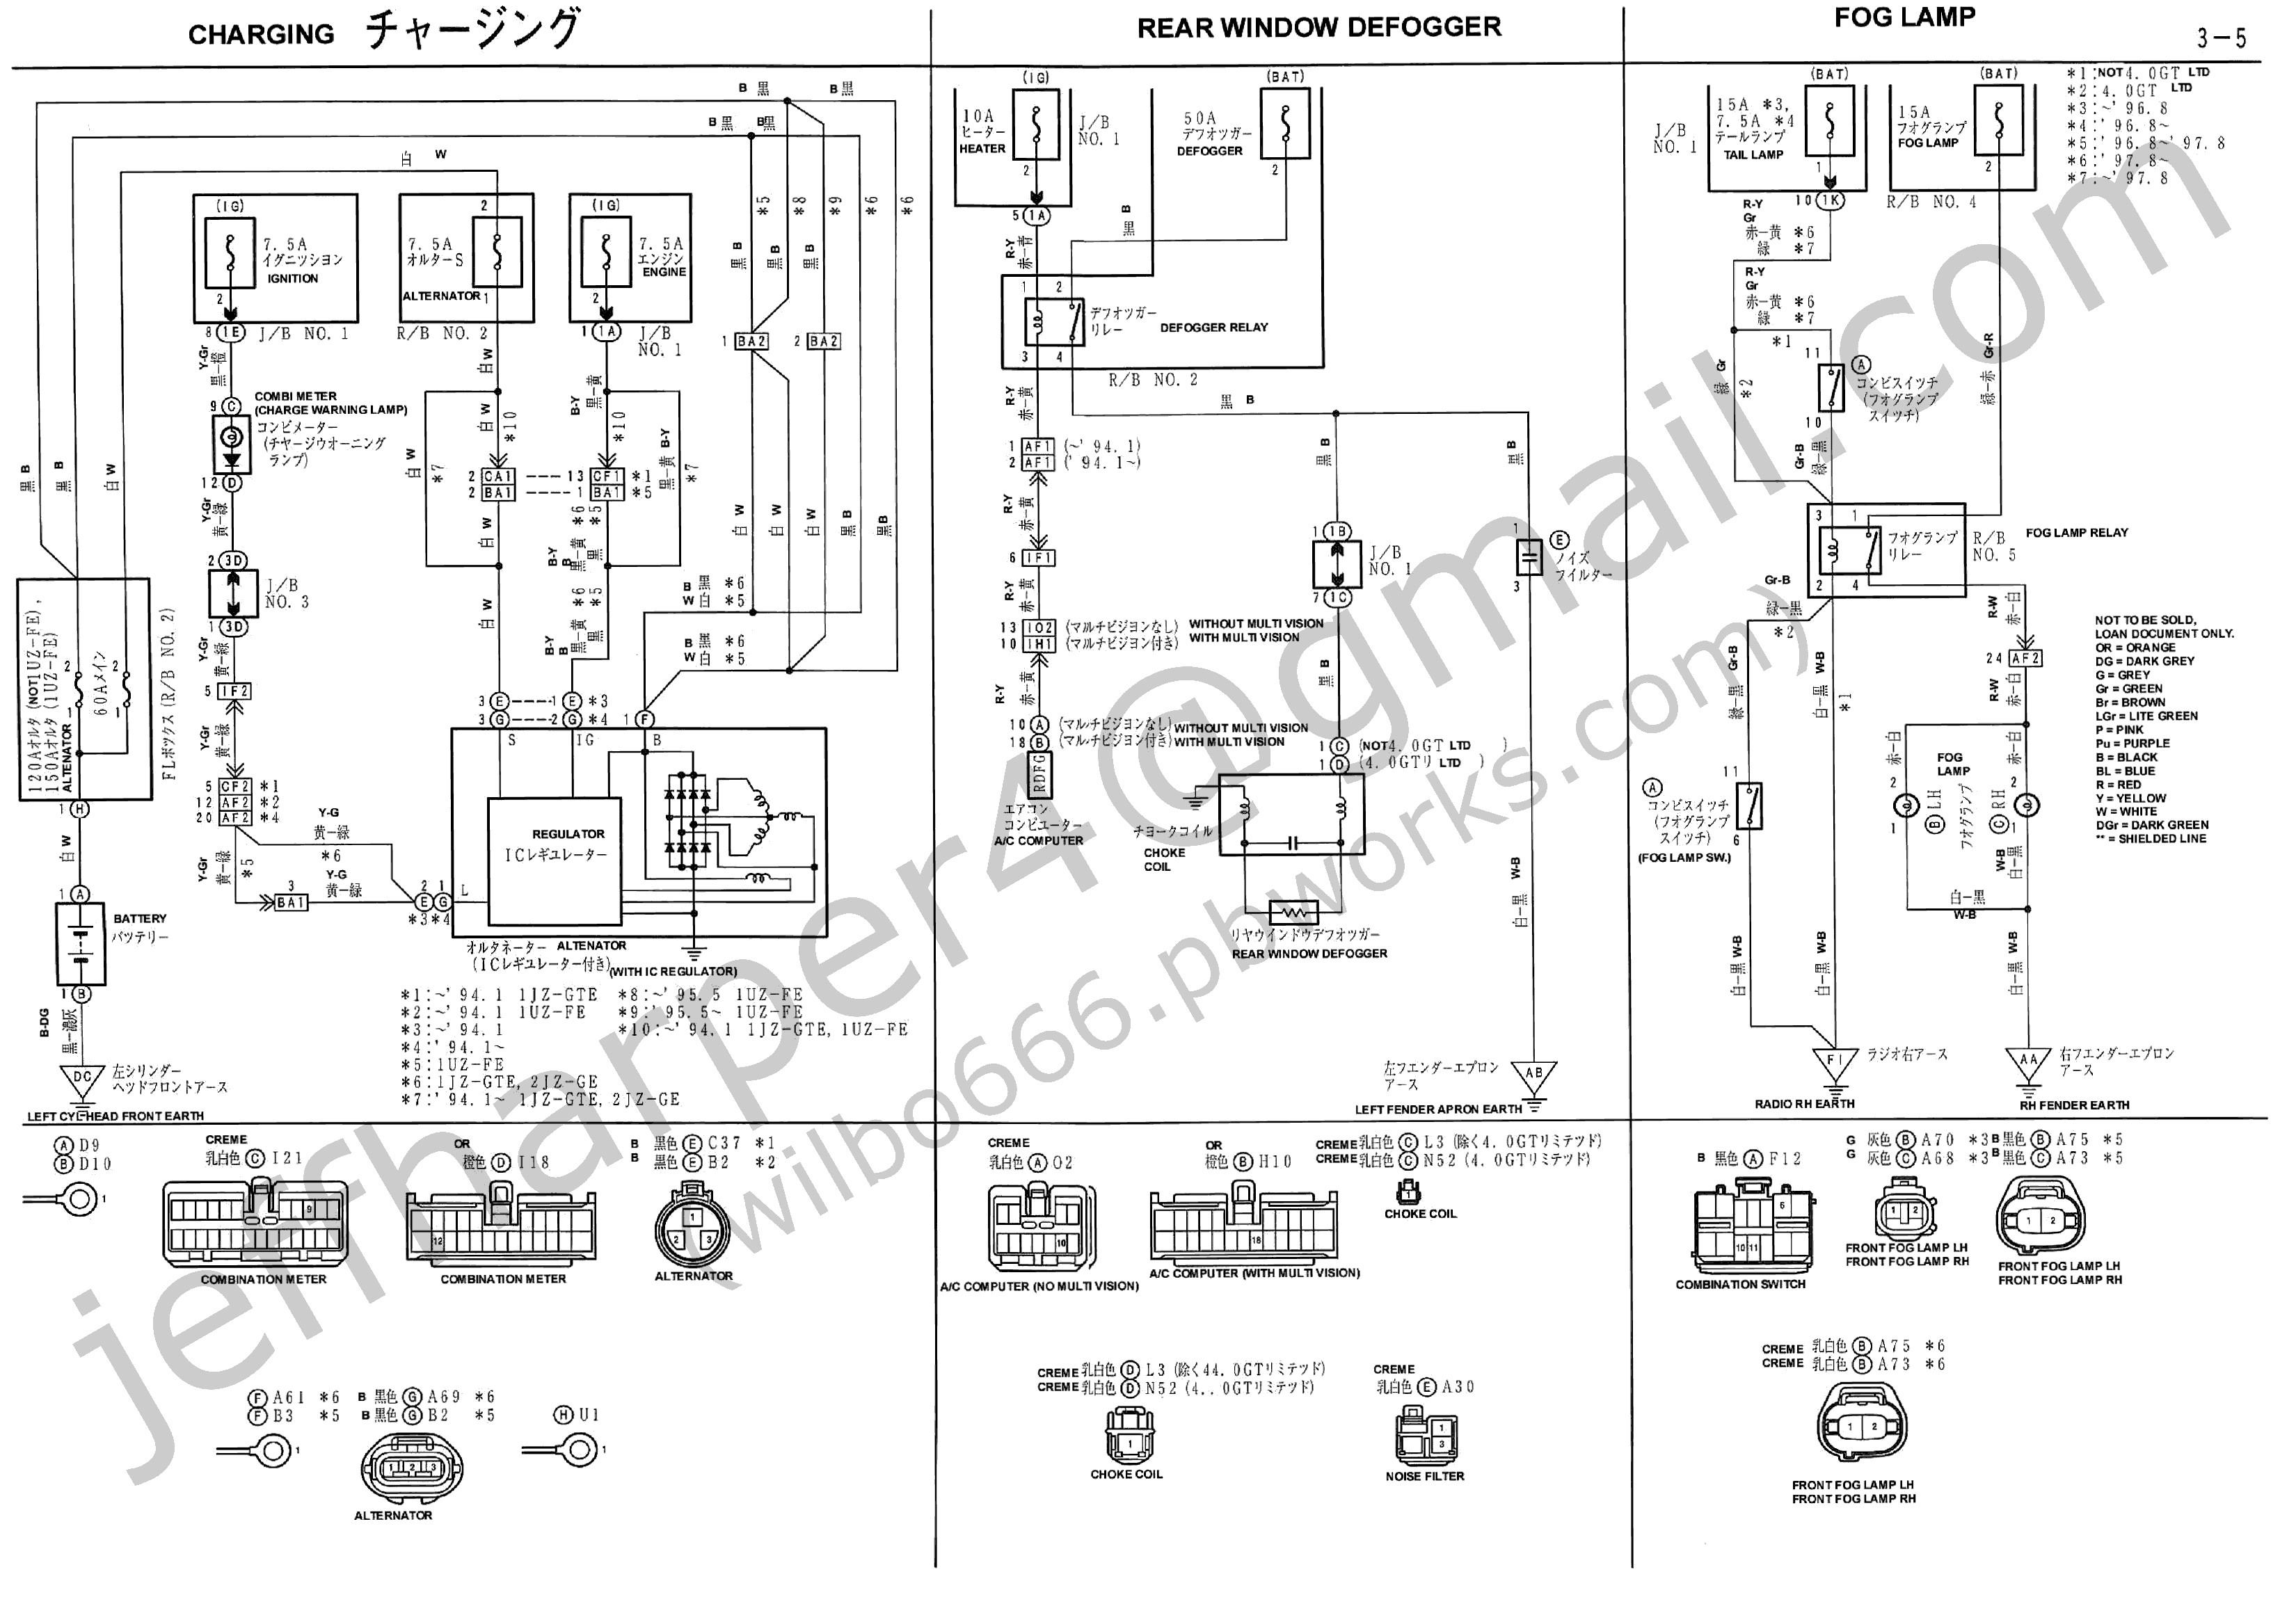 94 lexus alternator wiring wiring library toyota alternator wiring diagram wiring diagram image lexus exhaust 94 lexus alternator wiring asfbconference2016 Choice Image